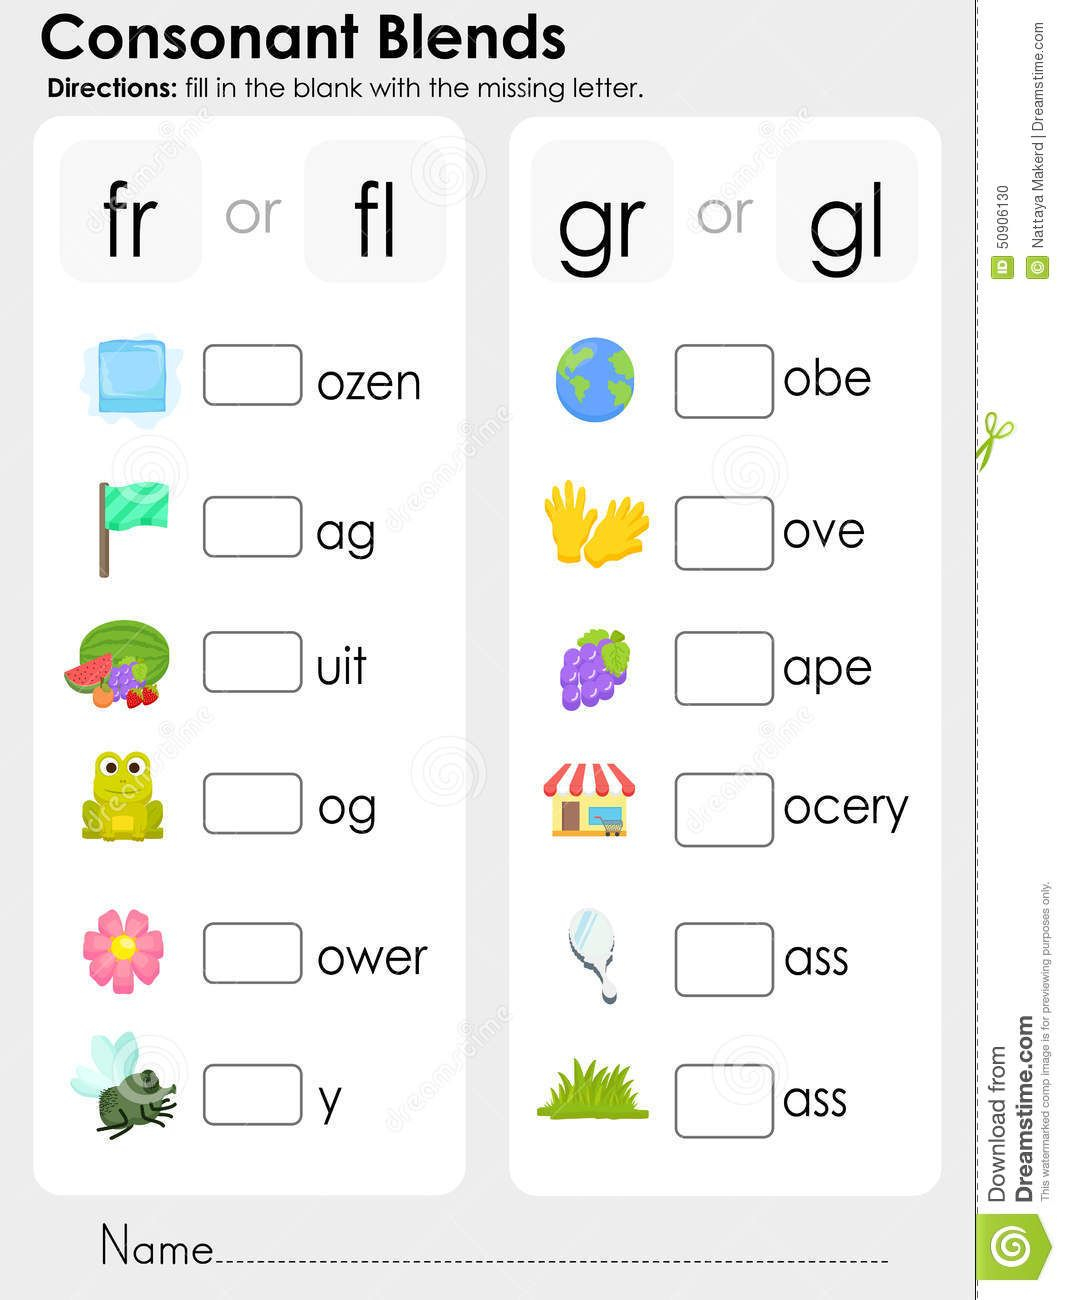 Consonant Blends Missing Letter Worksheet For Education with regard to Alphabet Blends Worksheets